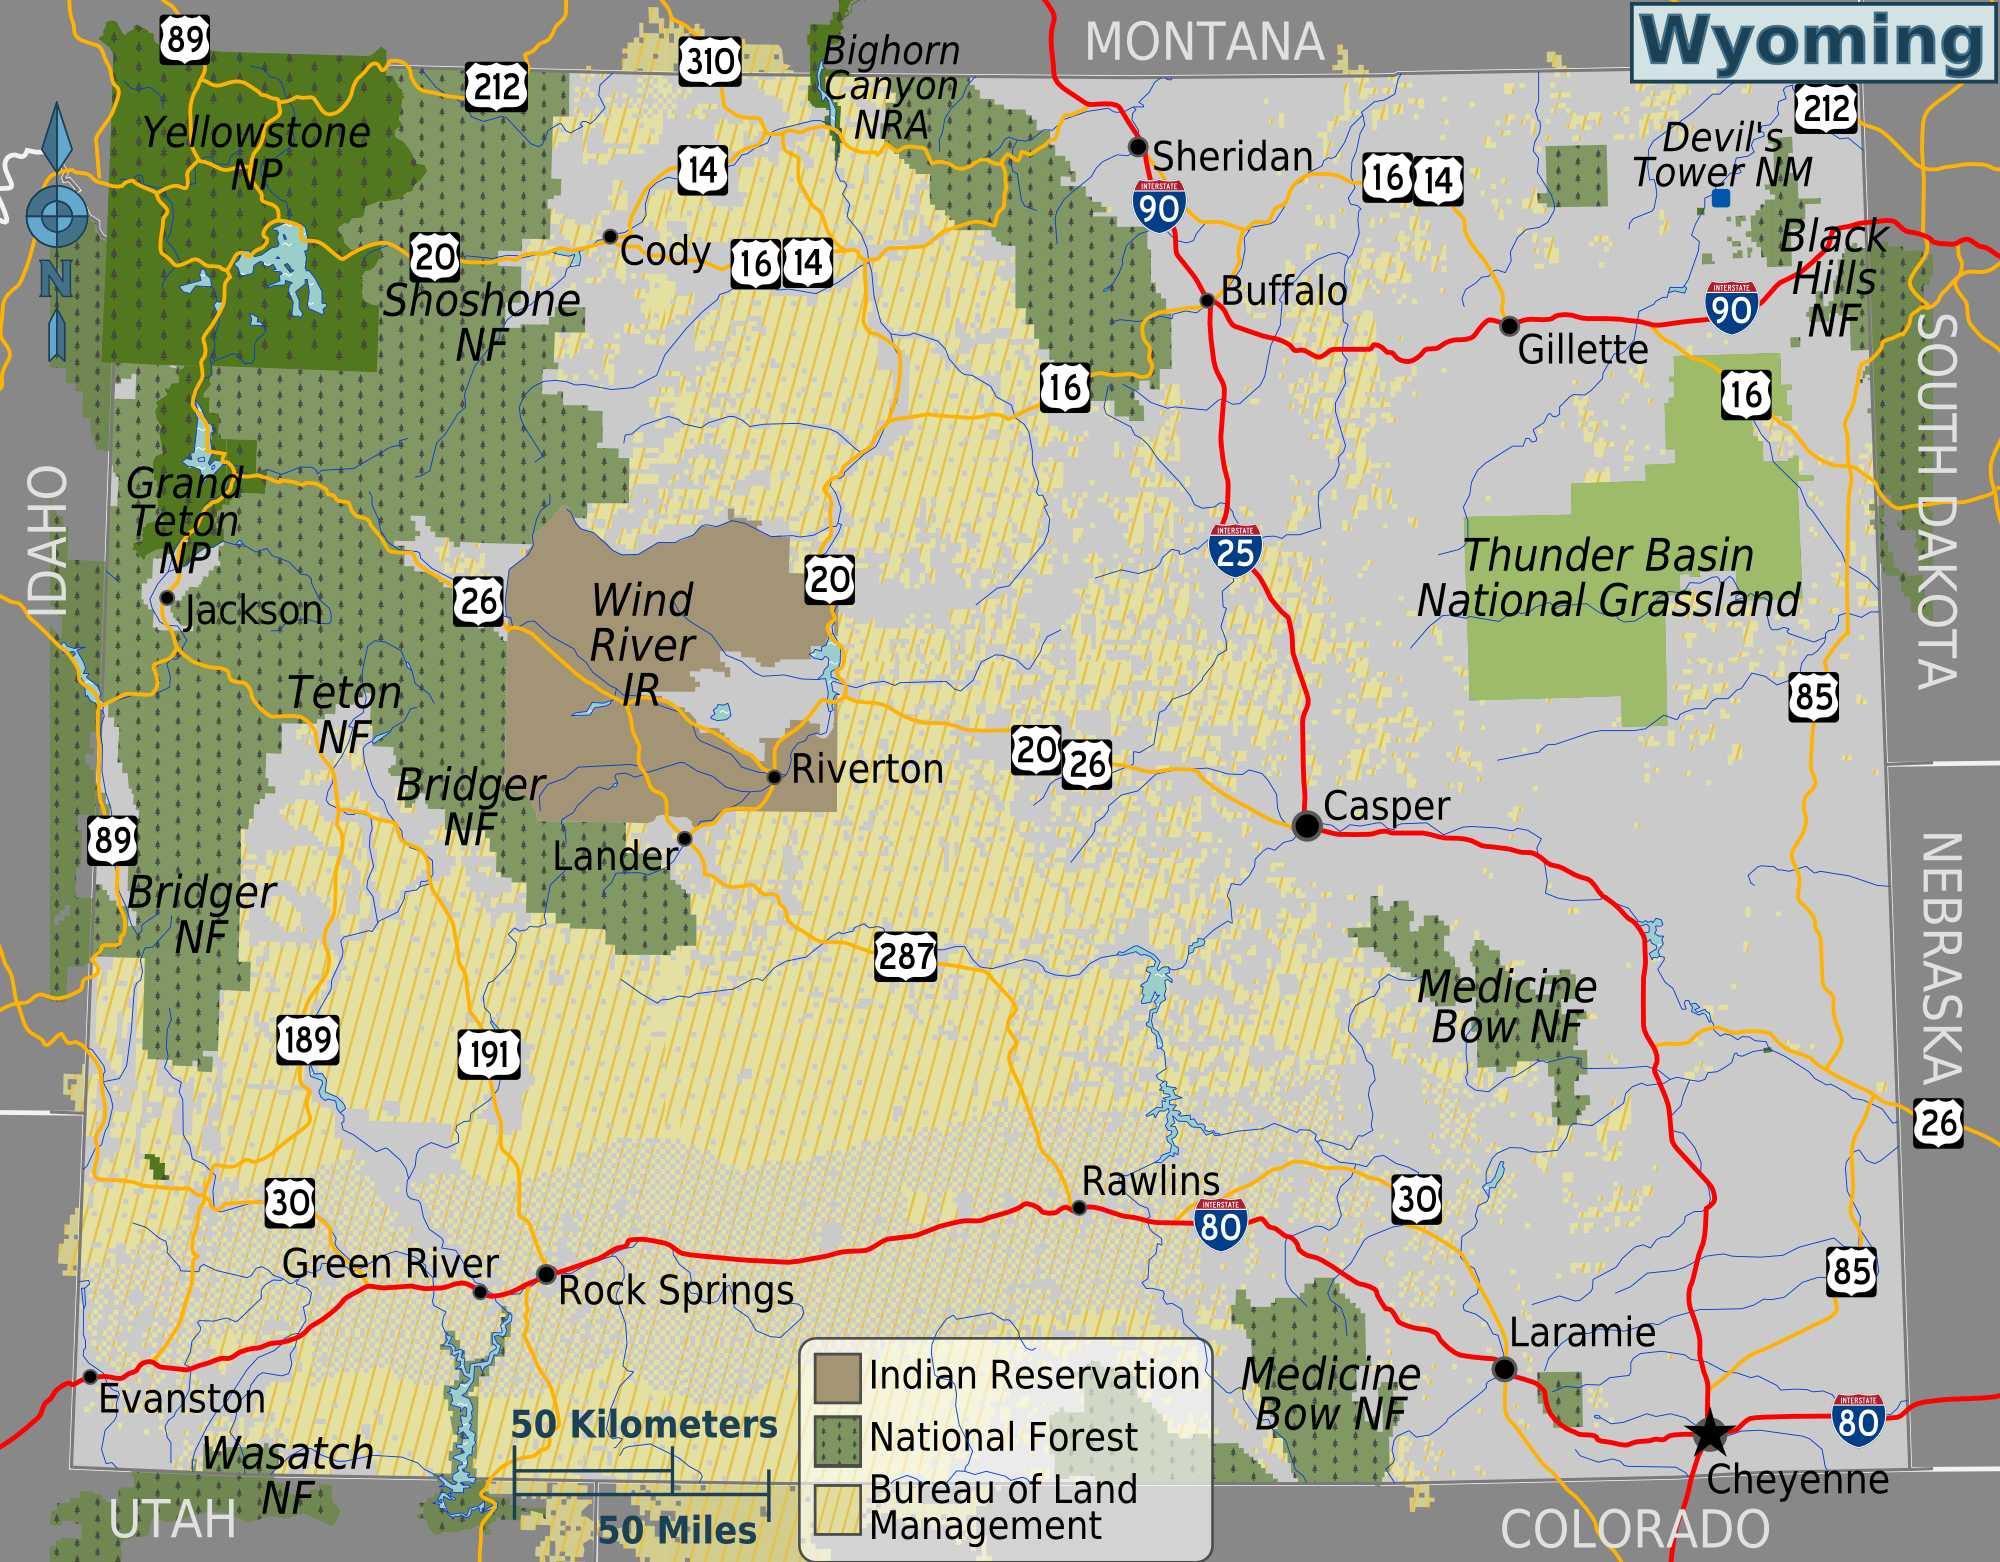 DOI Leaked Strategic Plan Re Affirms Energy Priorities | Wyoming